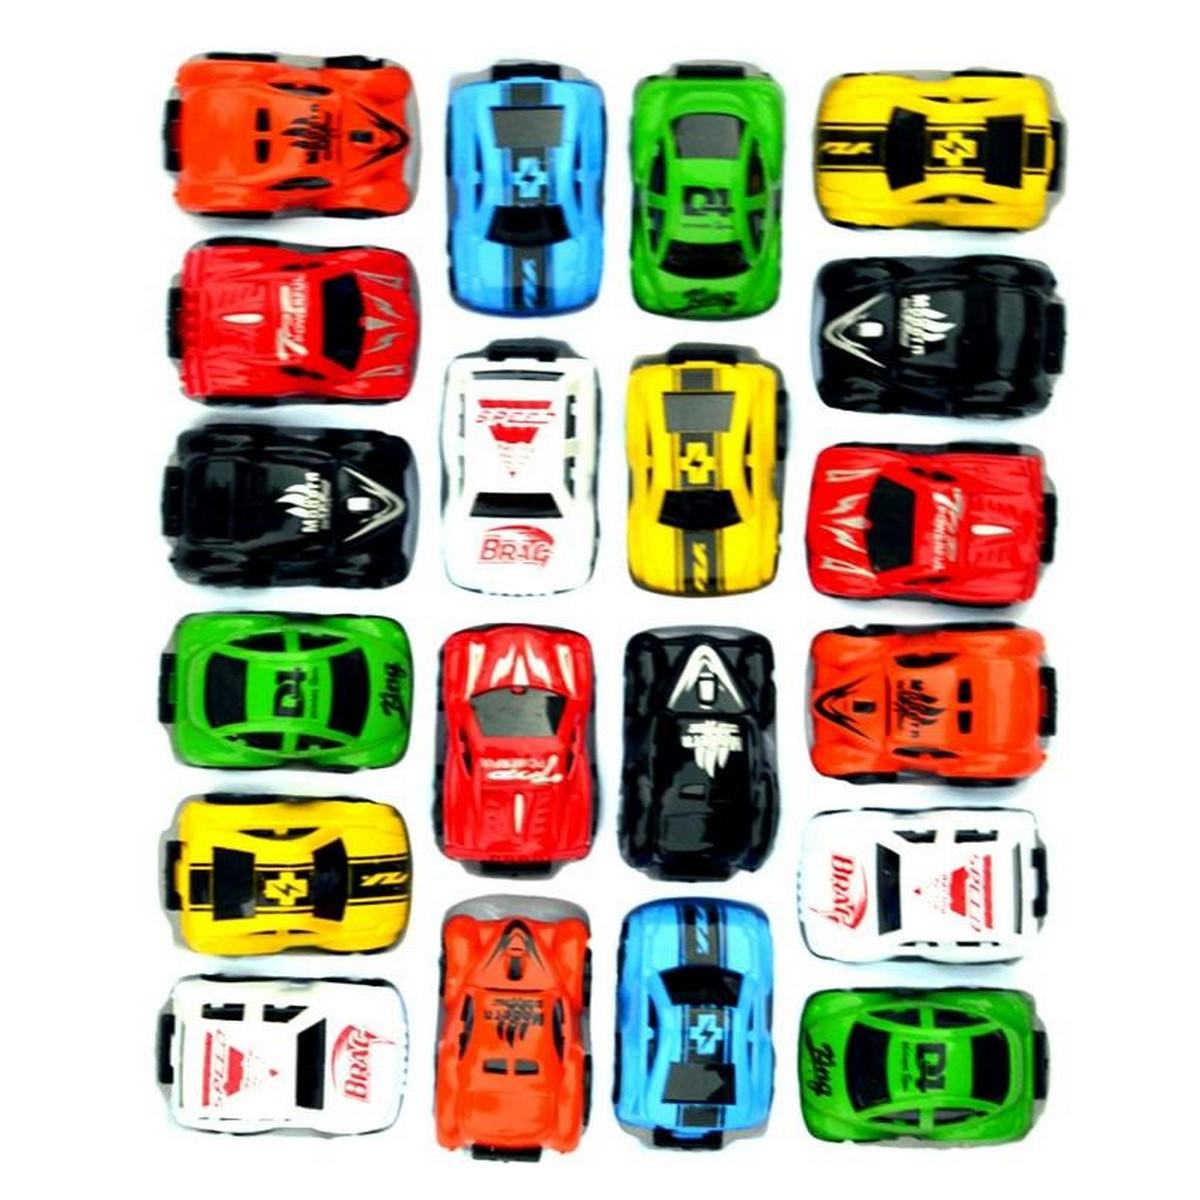 Pack of 20 - Mini Cars for Kids